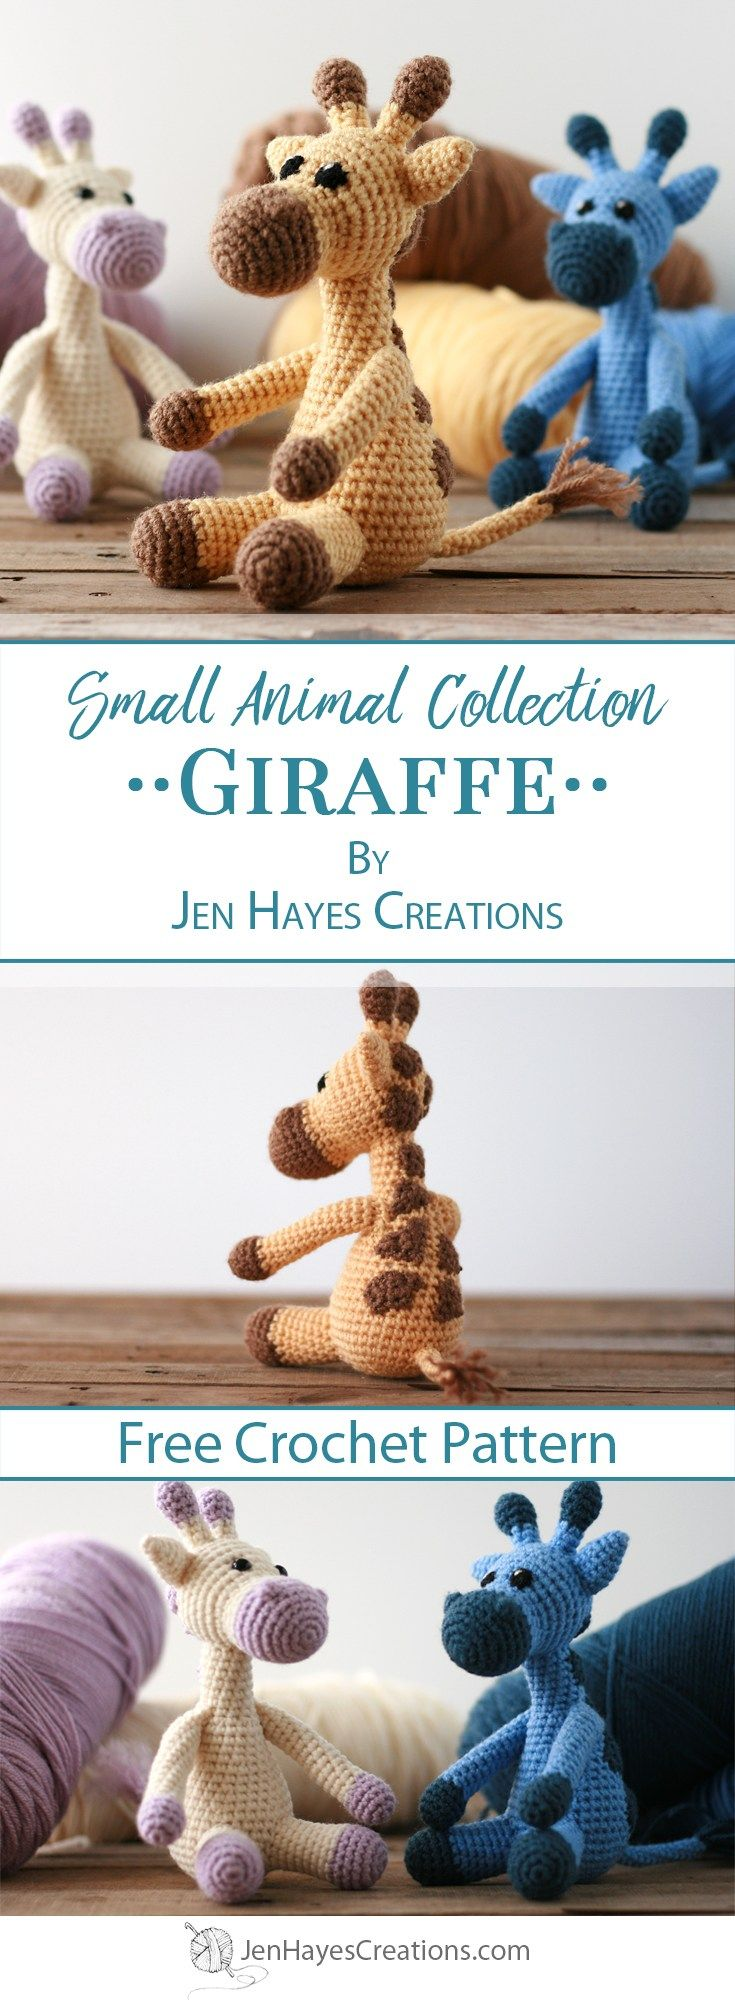 Small Animal Collection: Giraffe #crochetgiraffepattern